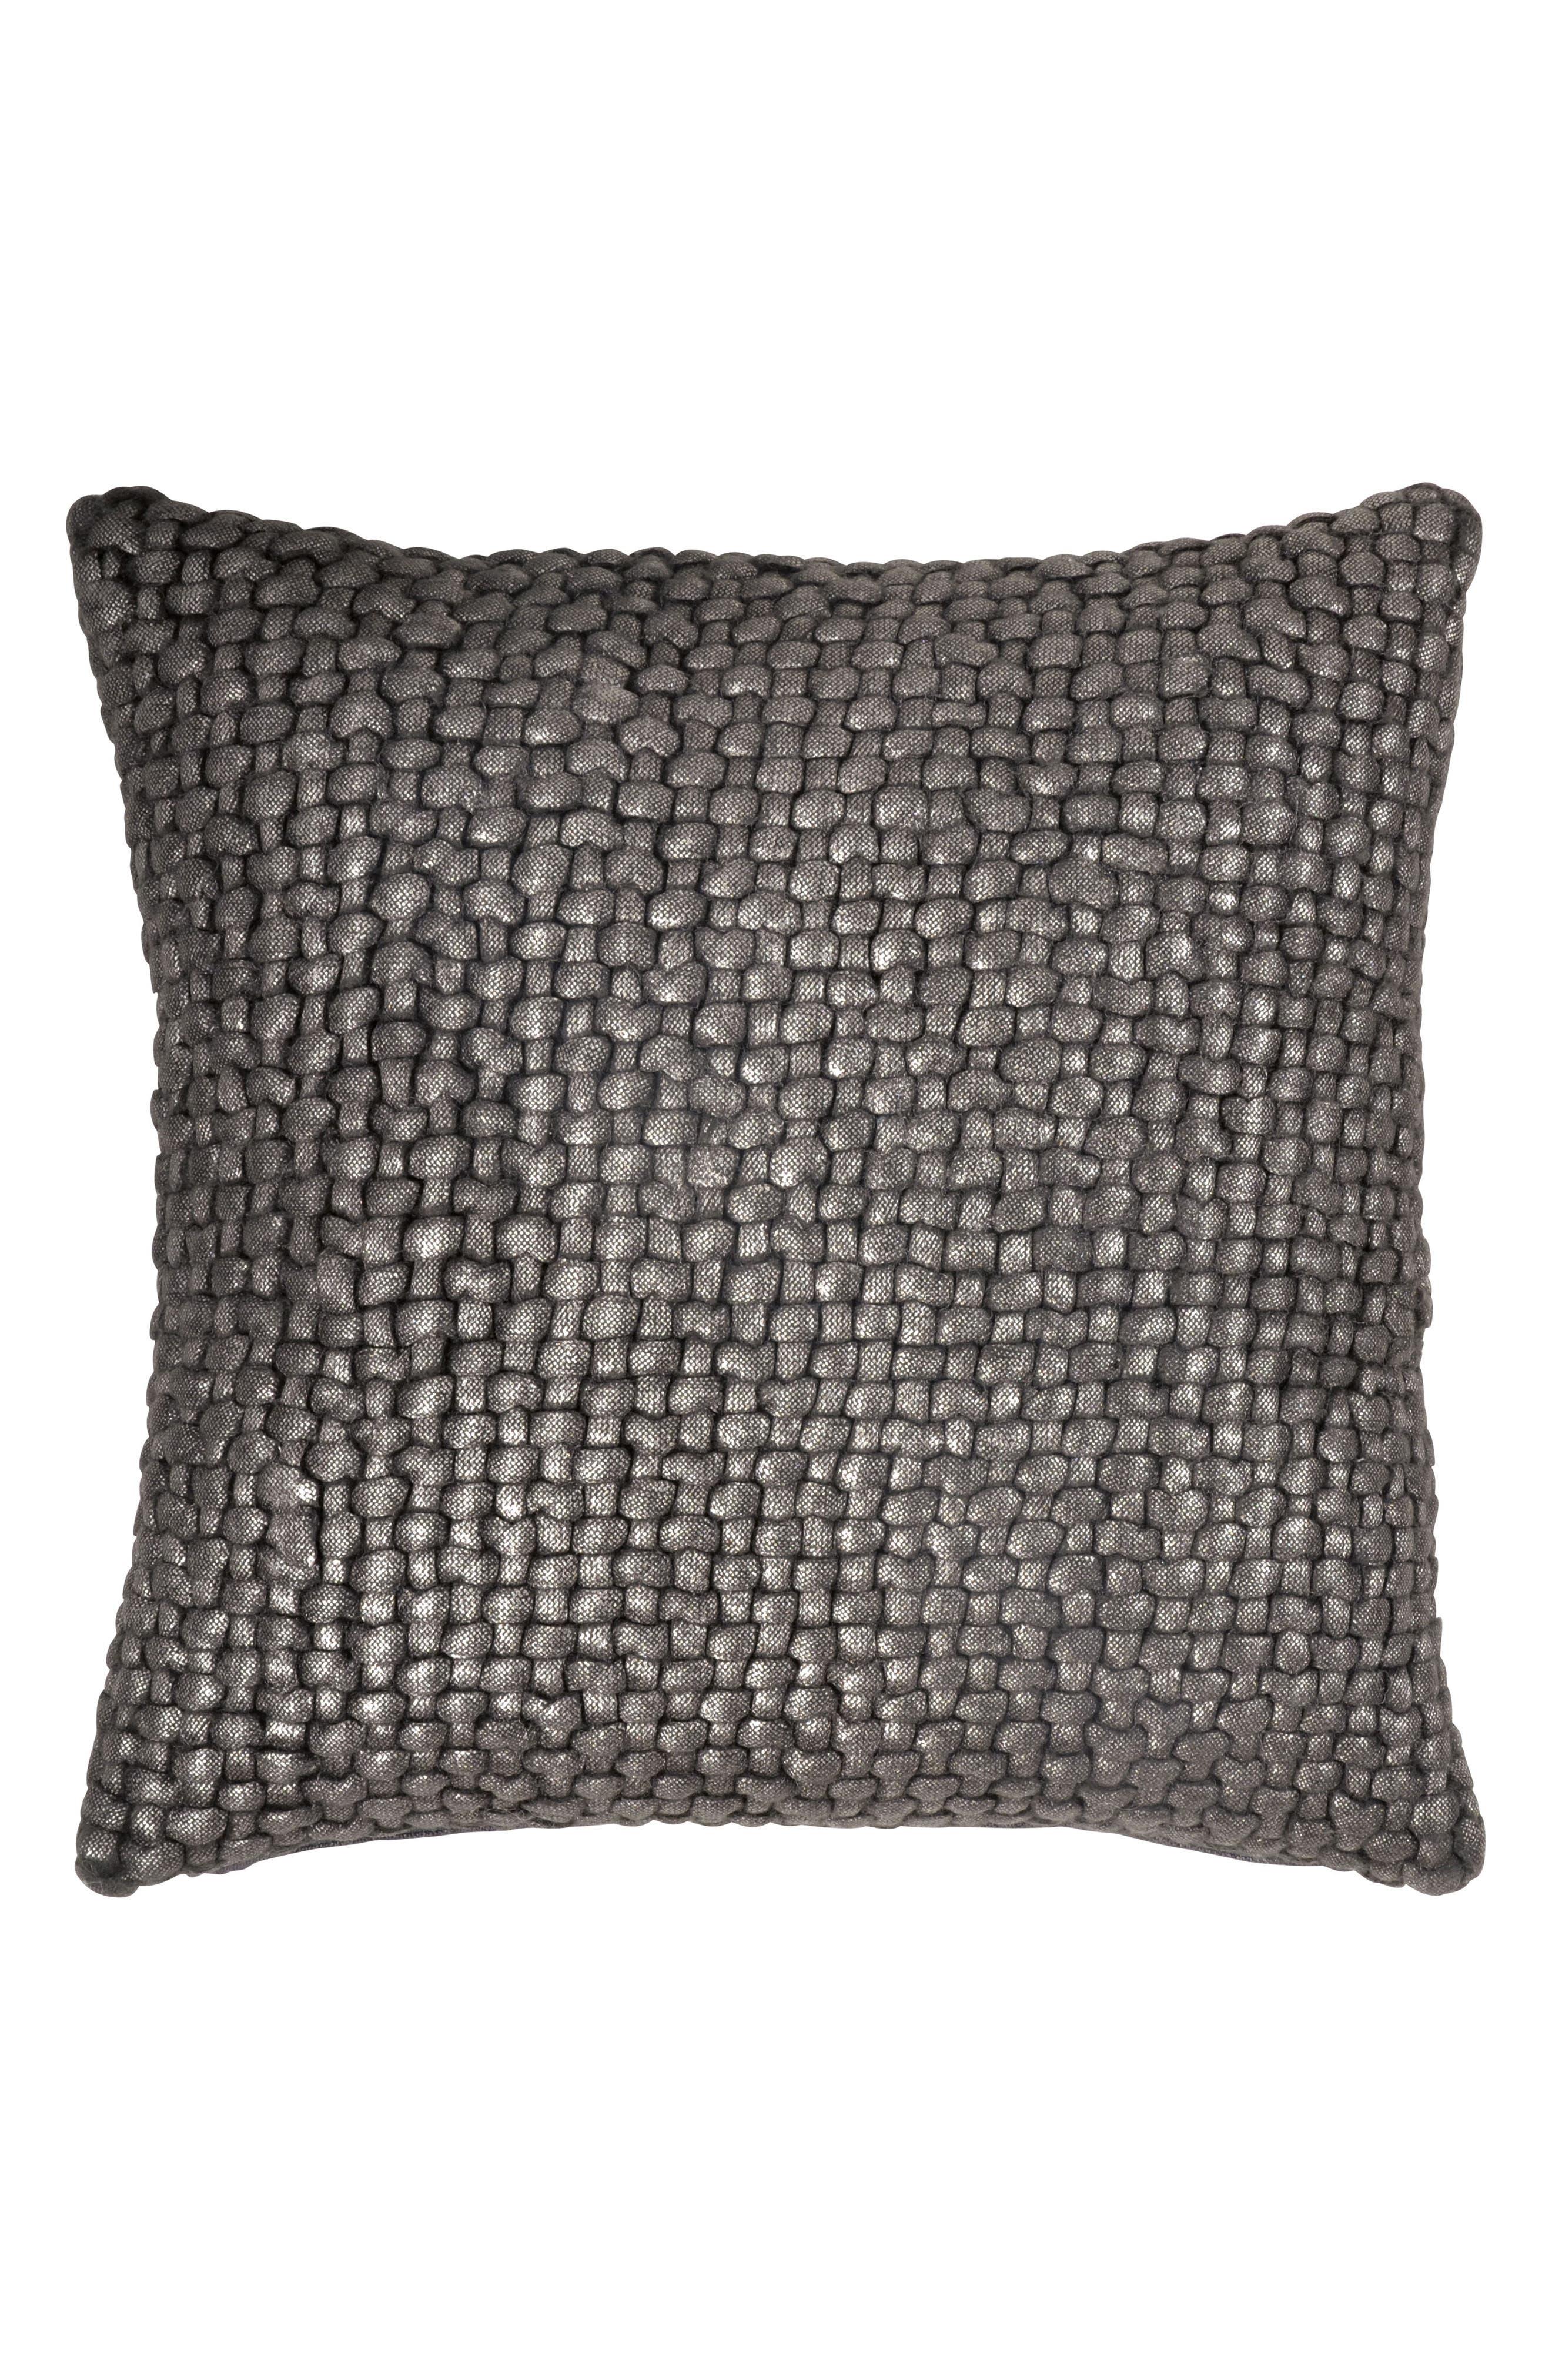 Metallic Basket Weave Accent Pillow,                         Main,                         color, Charcoal